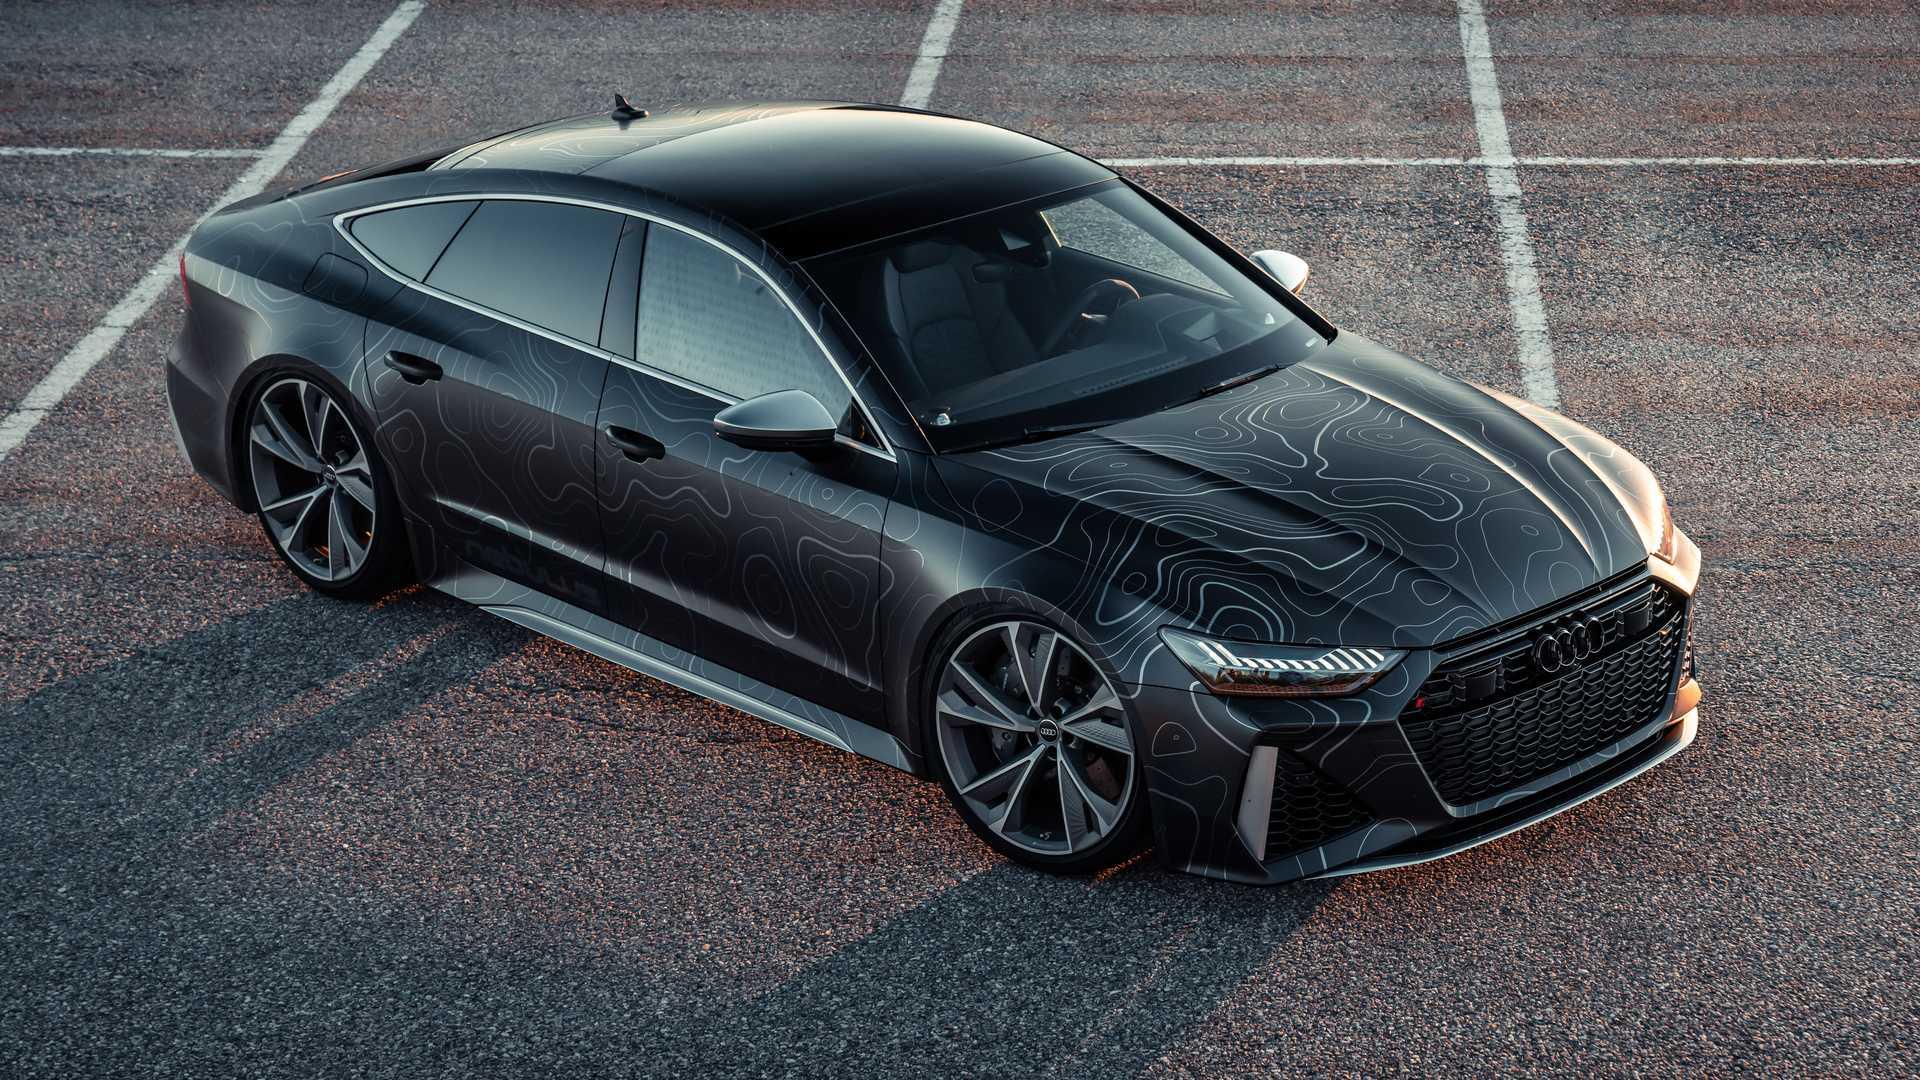 Audi-RS7-By-Black-Box-Richter-5